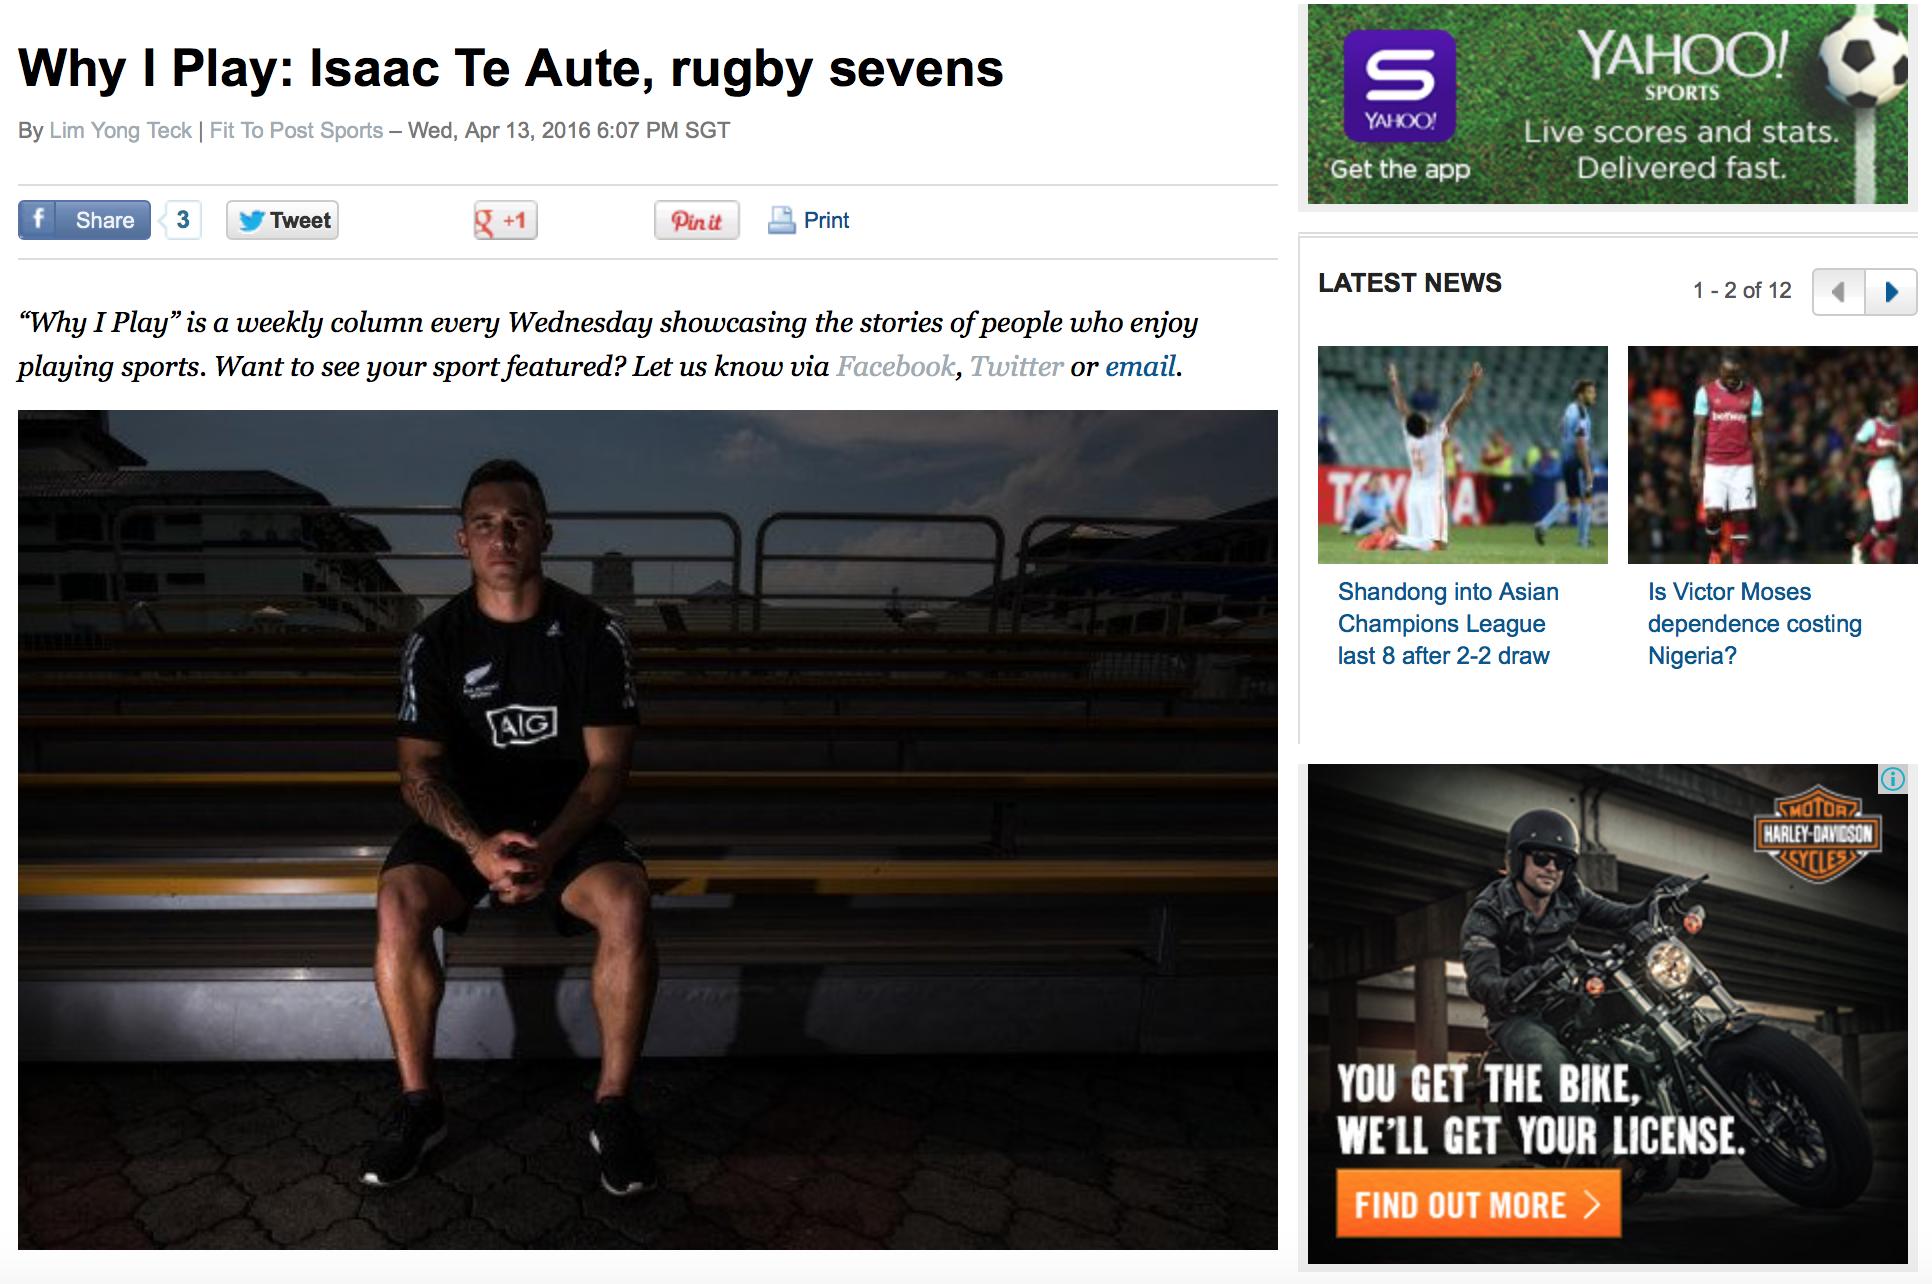 Isaac Te Aute feature for Yahoo! (www.yahoo.com)